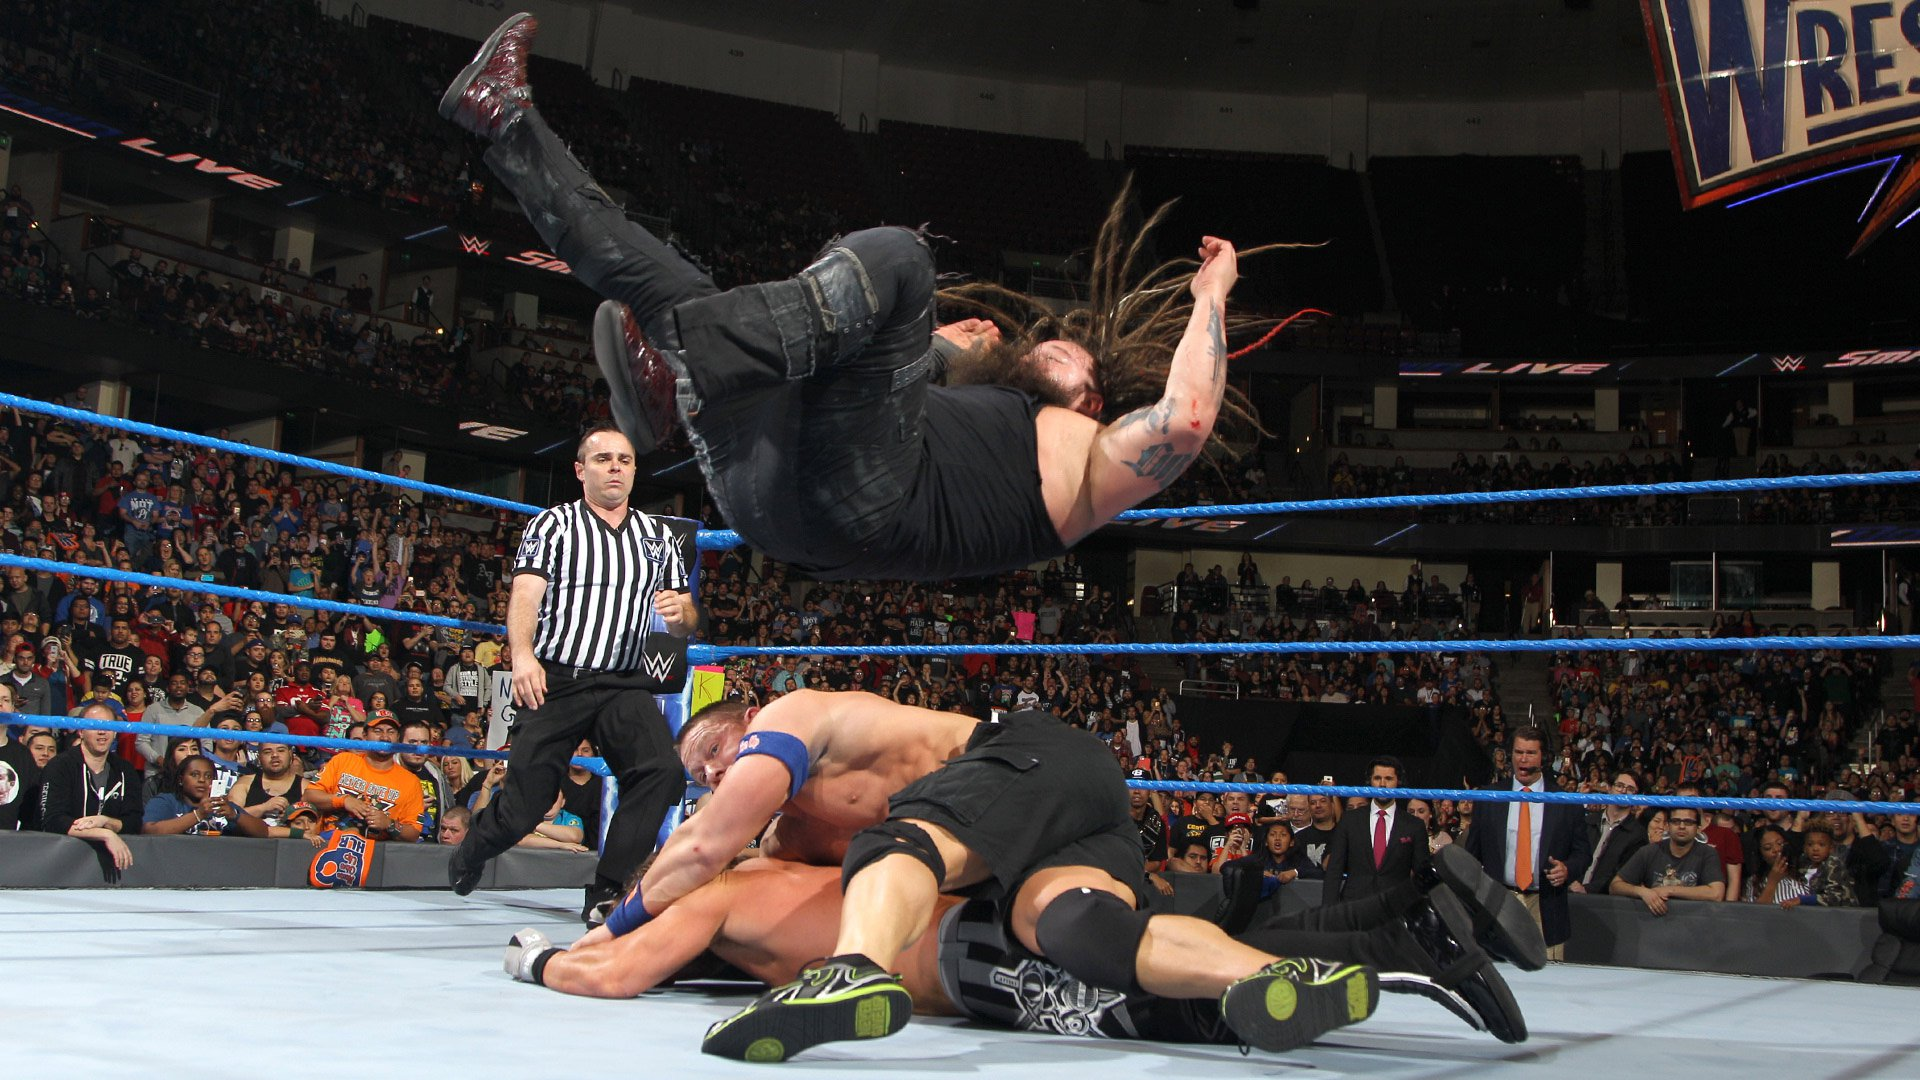 John Cena vs. Bray Wyatt vs. AJ Styles - Match Triple Menace pour le titre de Champion de la WWE: SmackDown LIVE, 14 fév. 2017